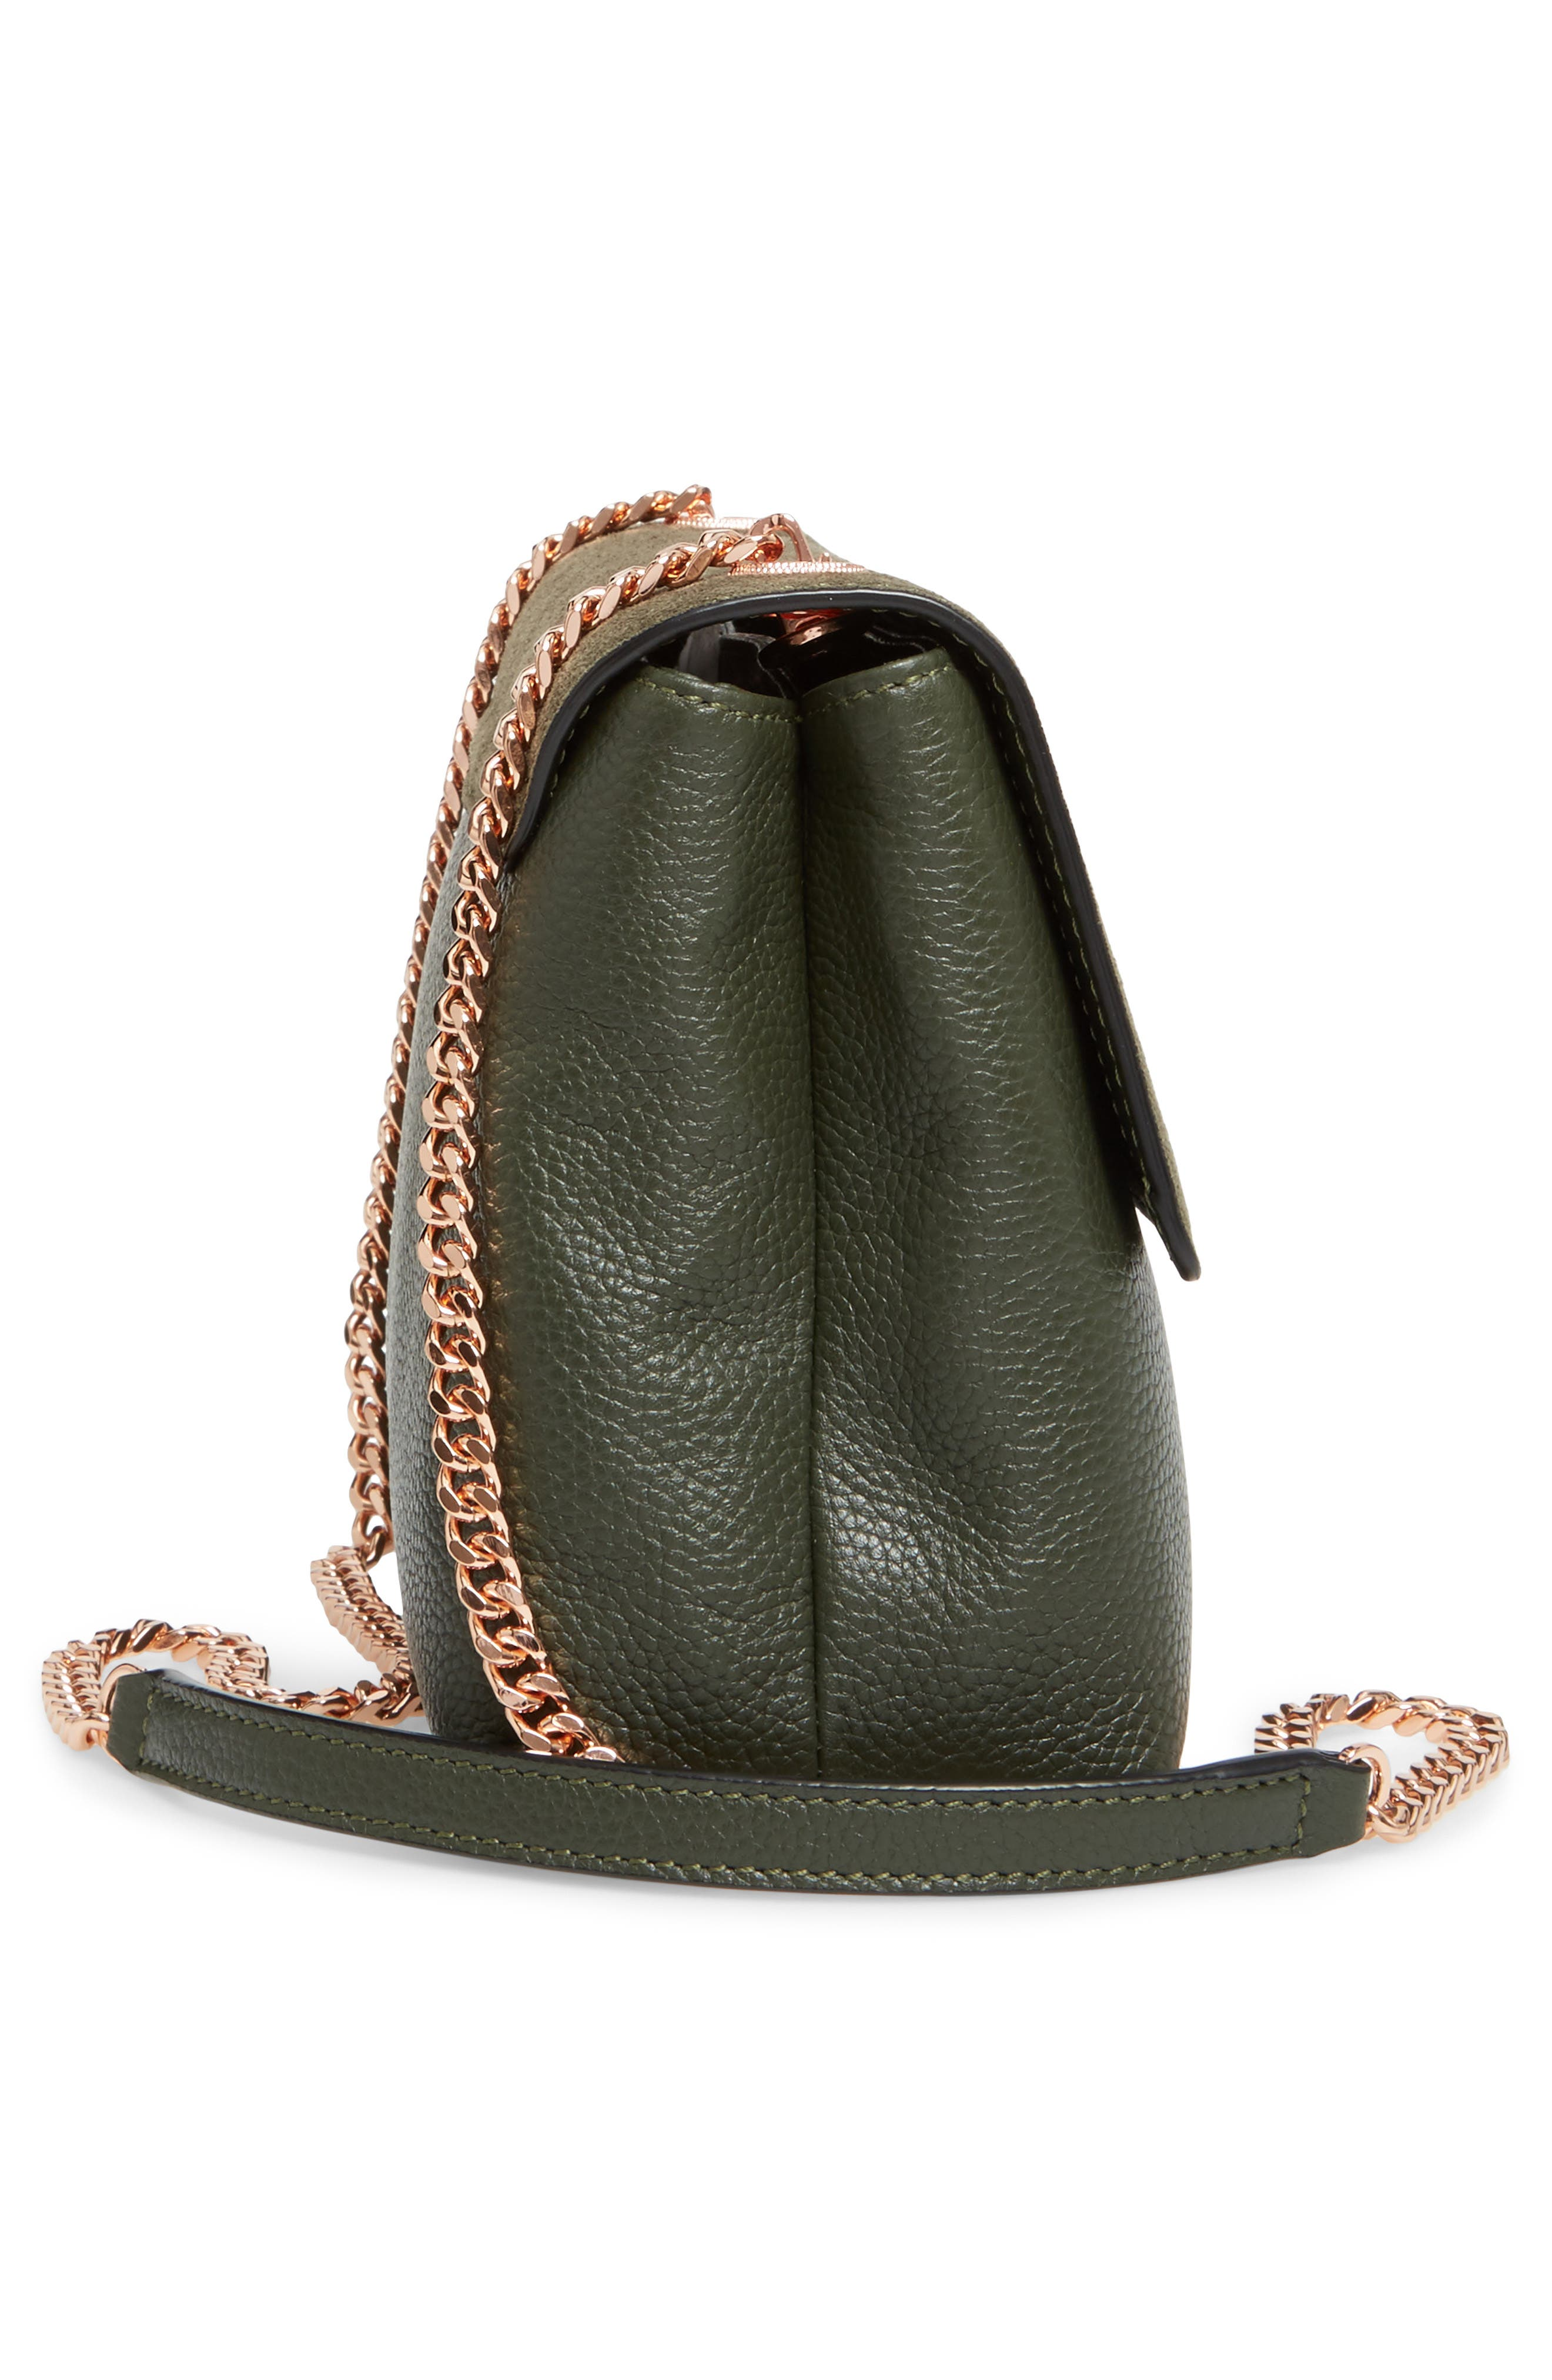 Sorikai Leather & Suede Crossbody Bag,                             Alternate thumbnail 4, color,                             Khaki